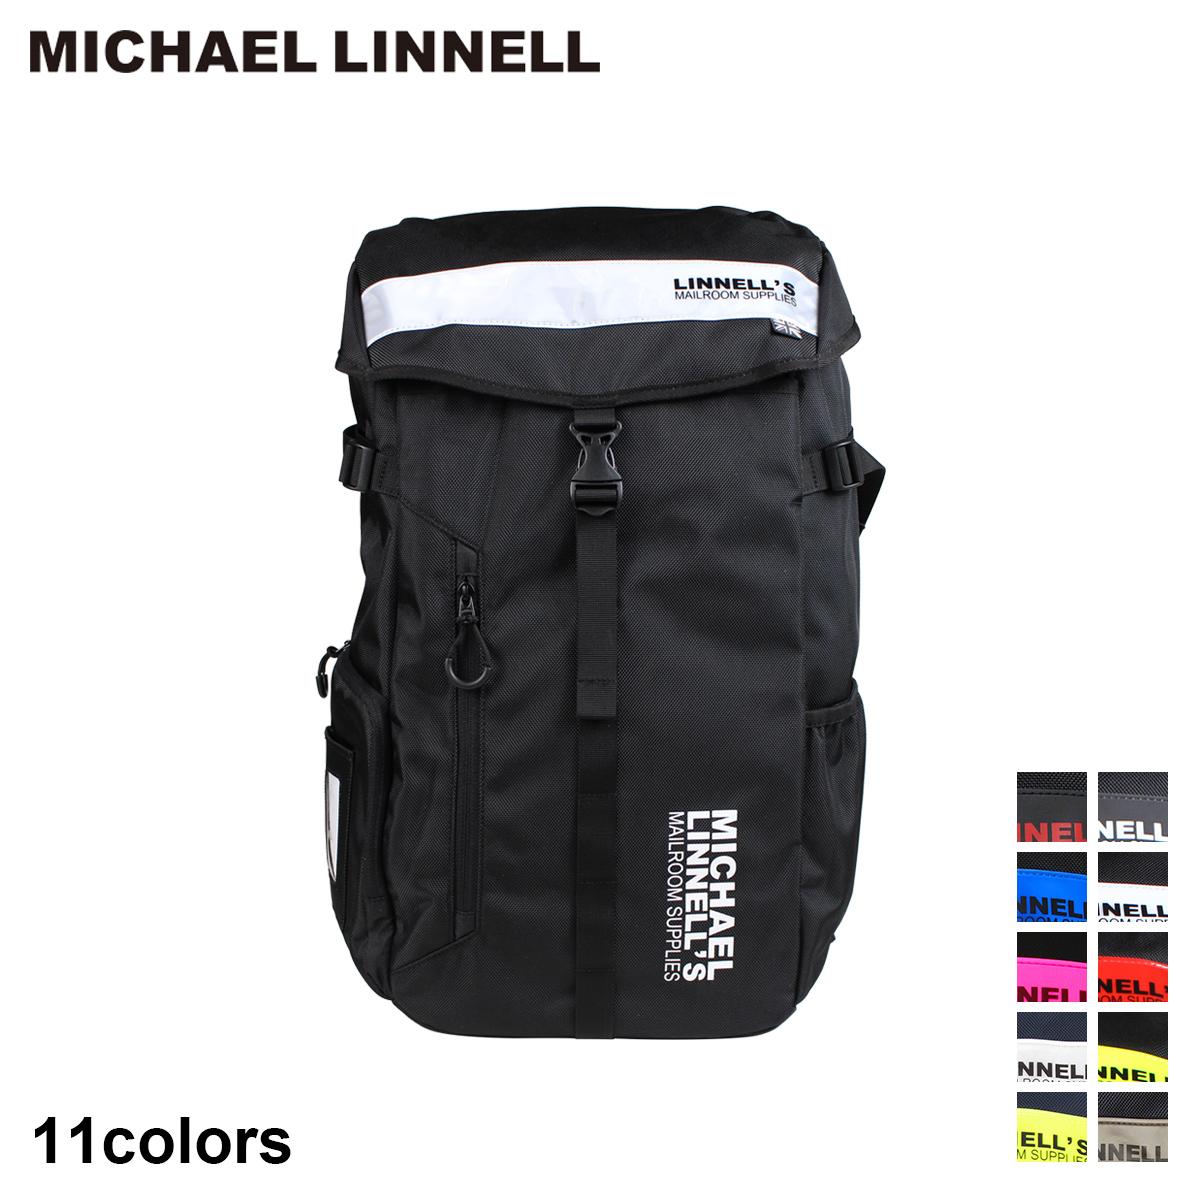 MICHAEL LINNELL BIG BACKPACK マイケルリンネル リュック バッグ 30L メンズ レディース バックパック ブラック ネイビー 黒 ML-008 [7/31 追加入荷]